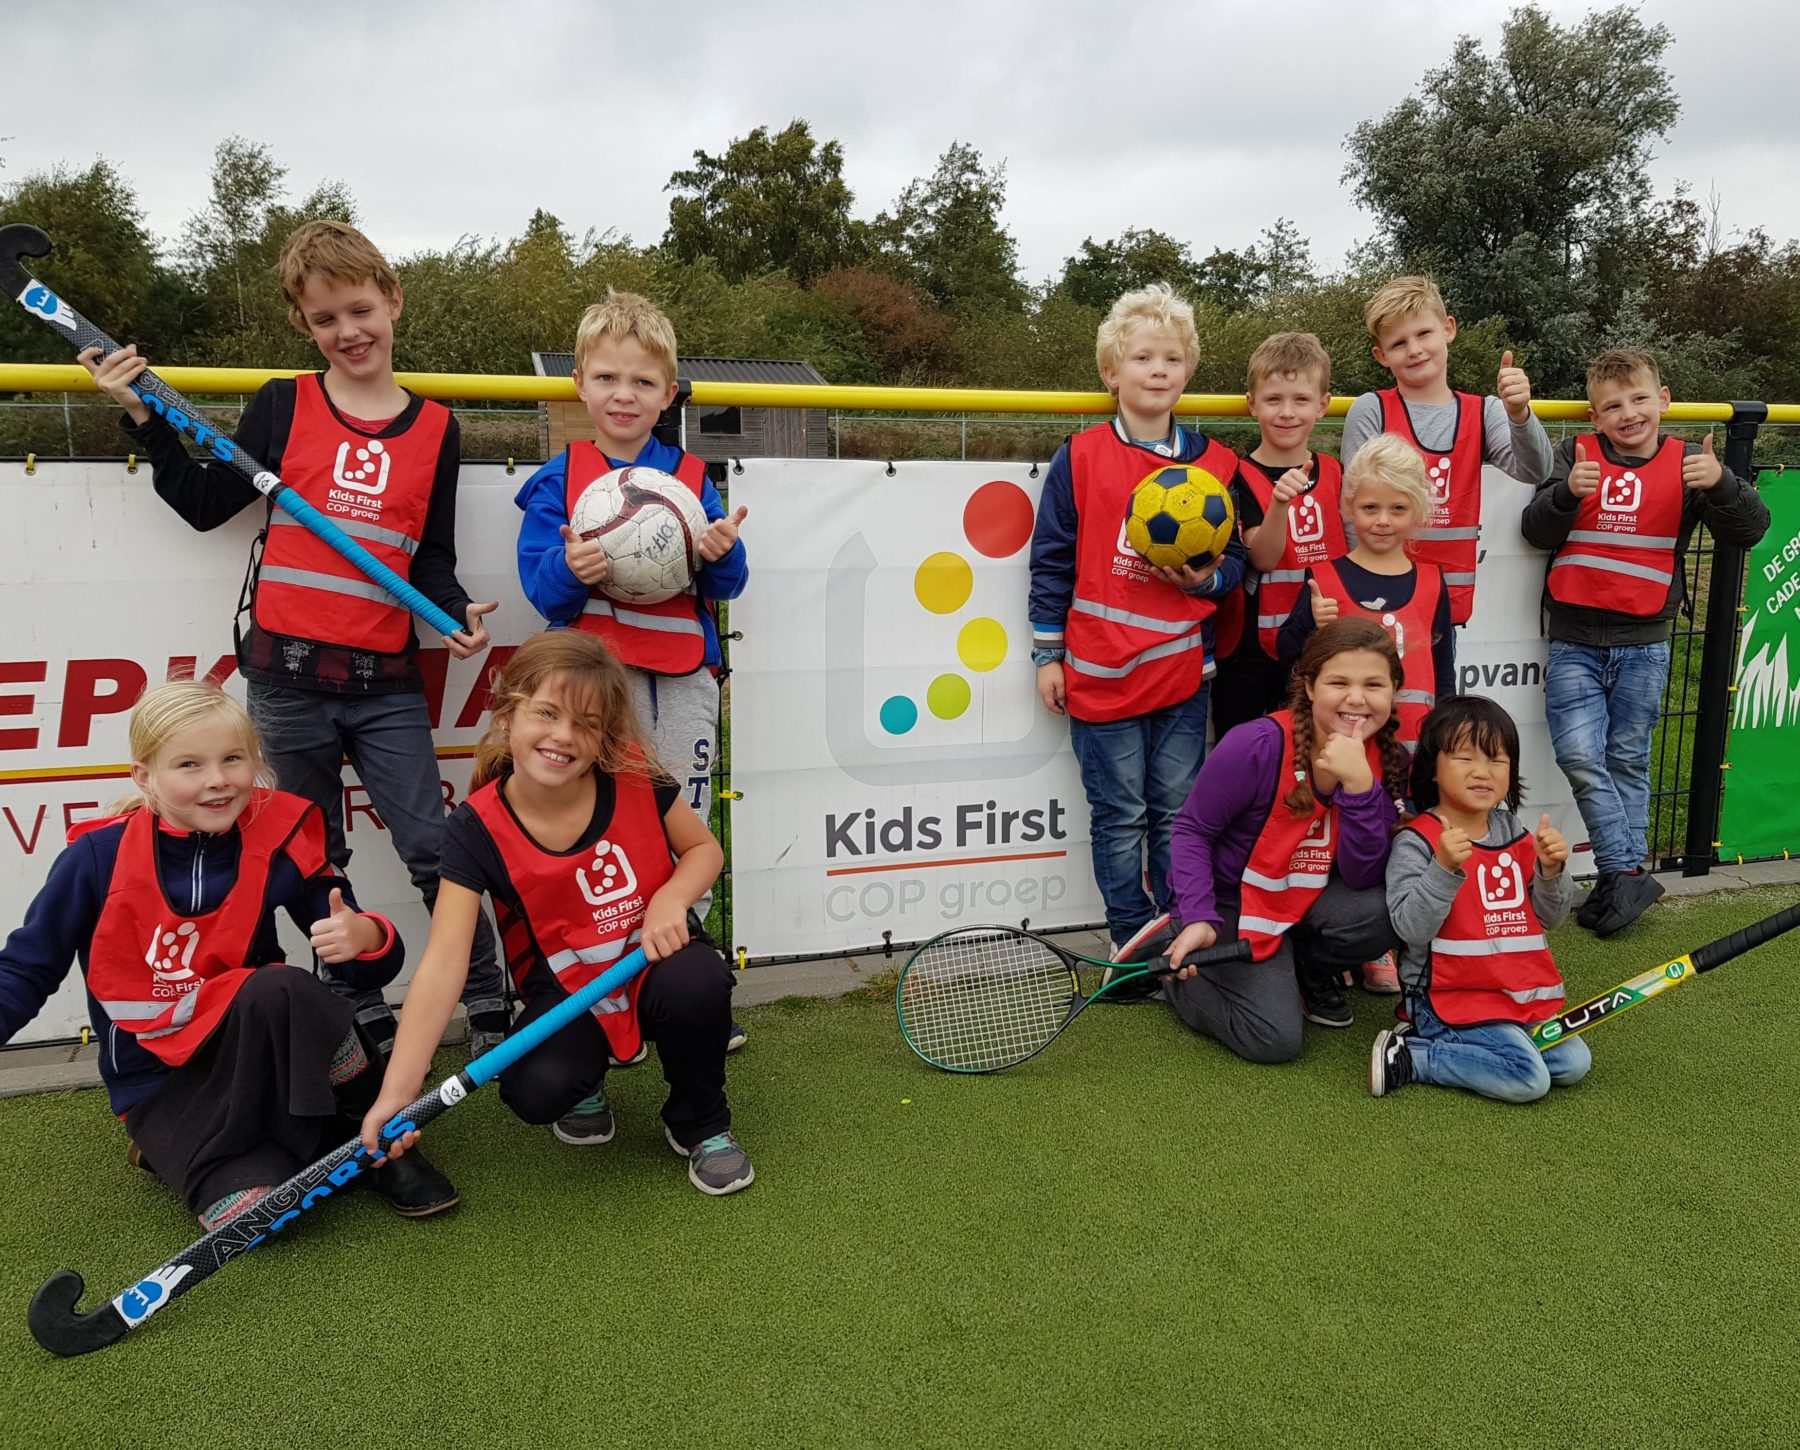 Buitenschoolse opvang 4 - 12 jaar BSO Kids First COP groep